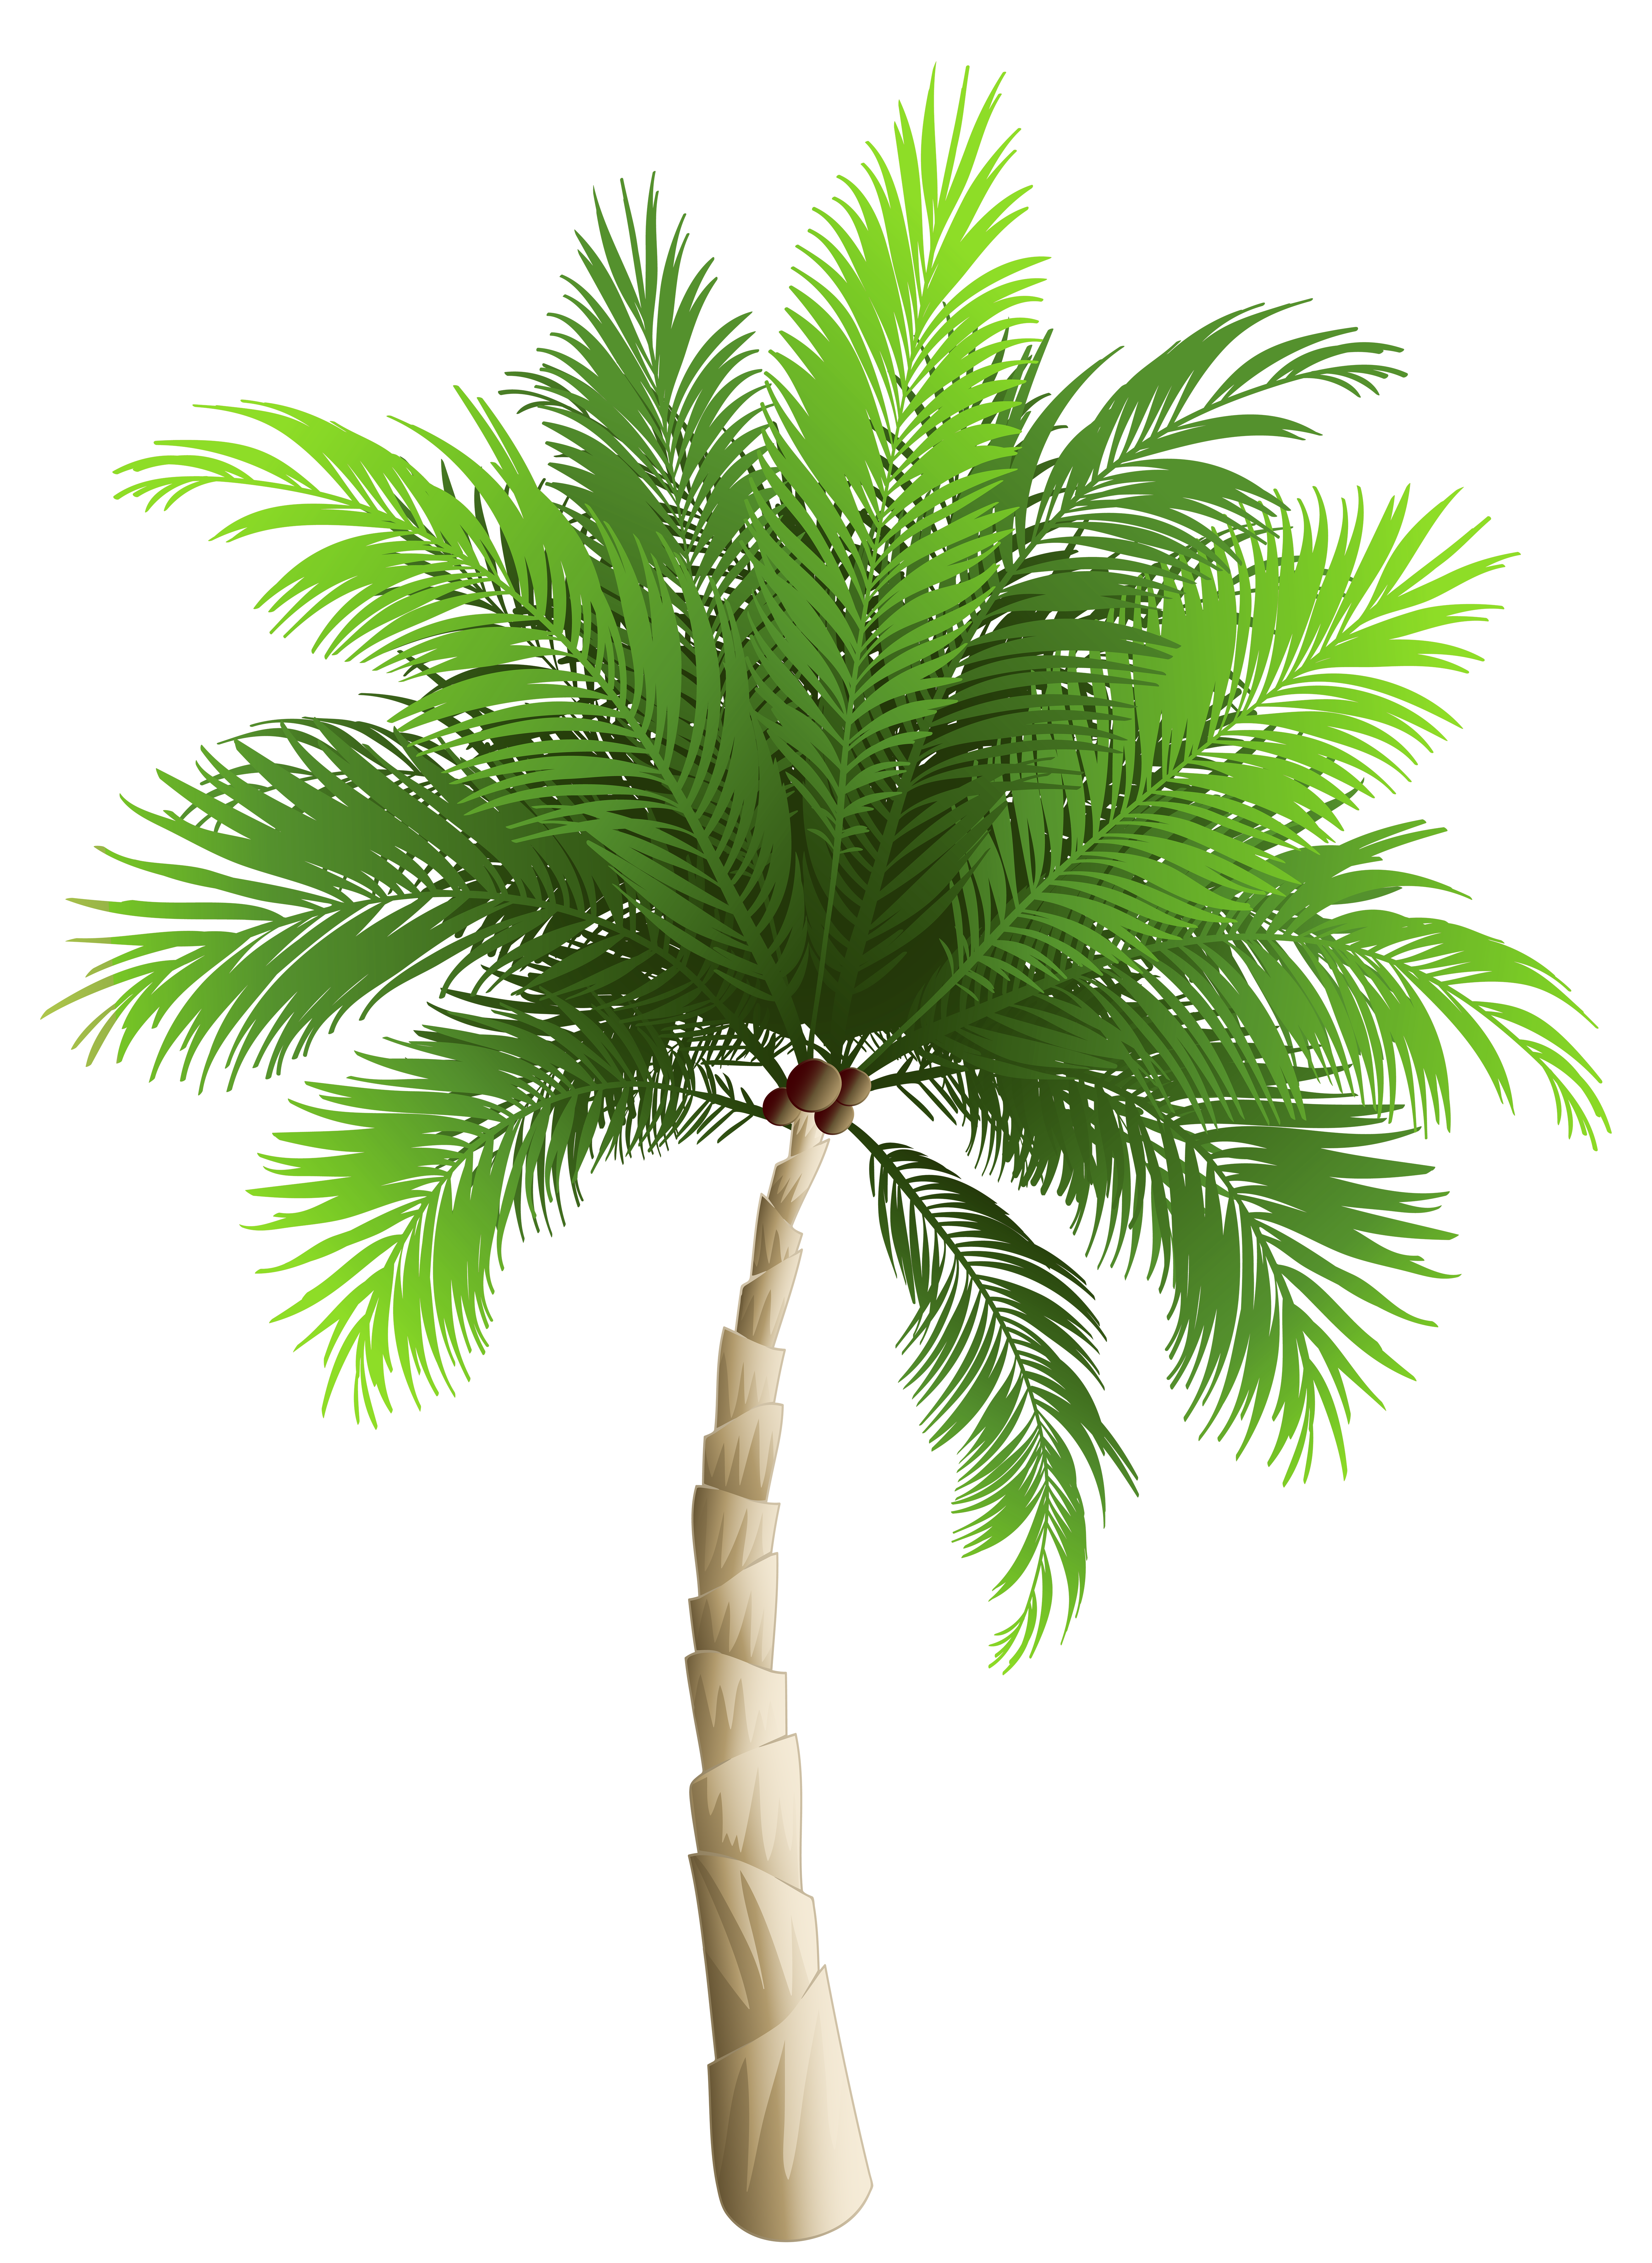 Png image gallery yopriceville. Desert clipart palm tree desert